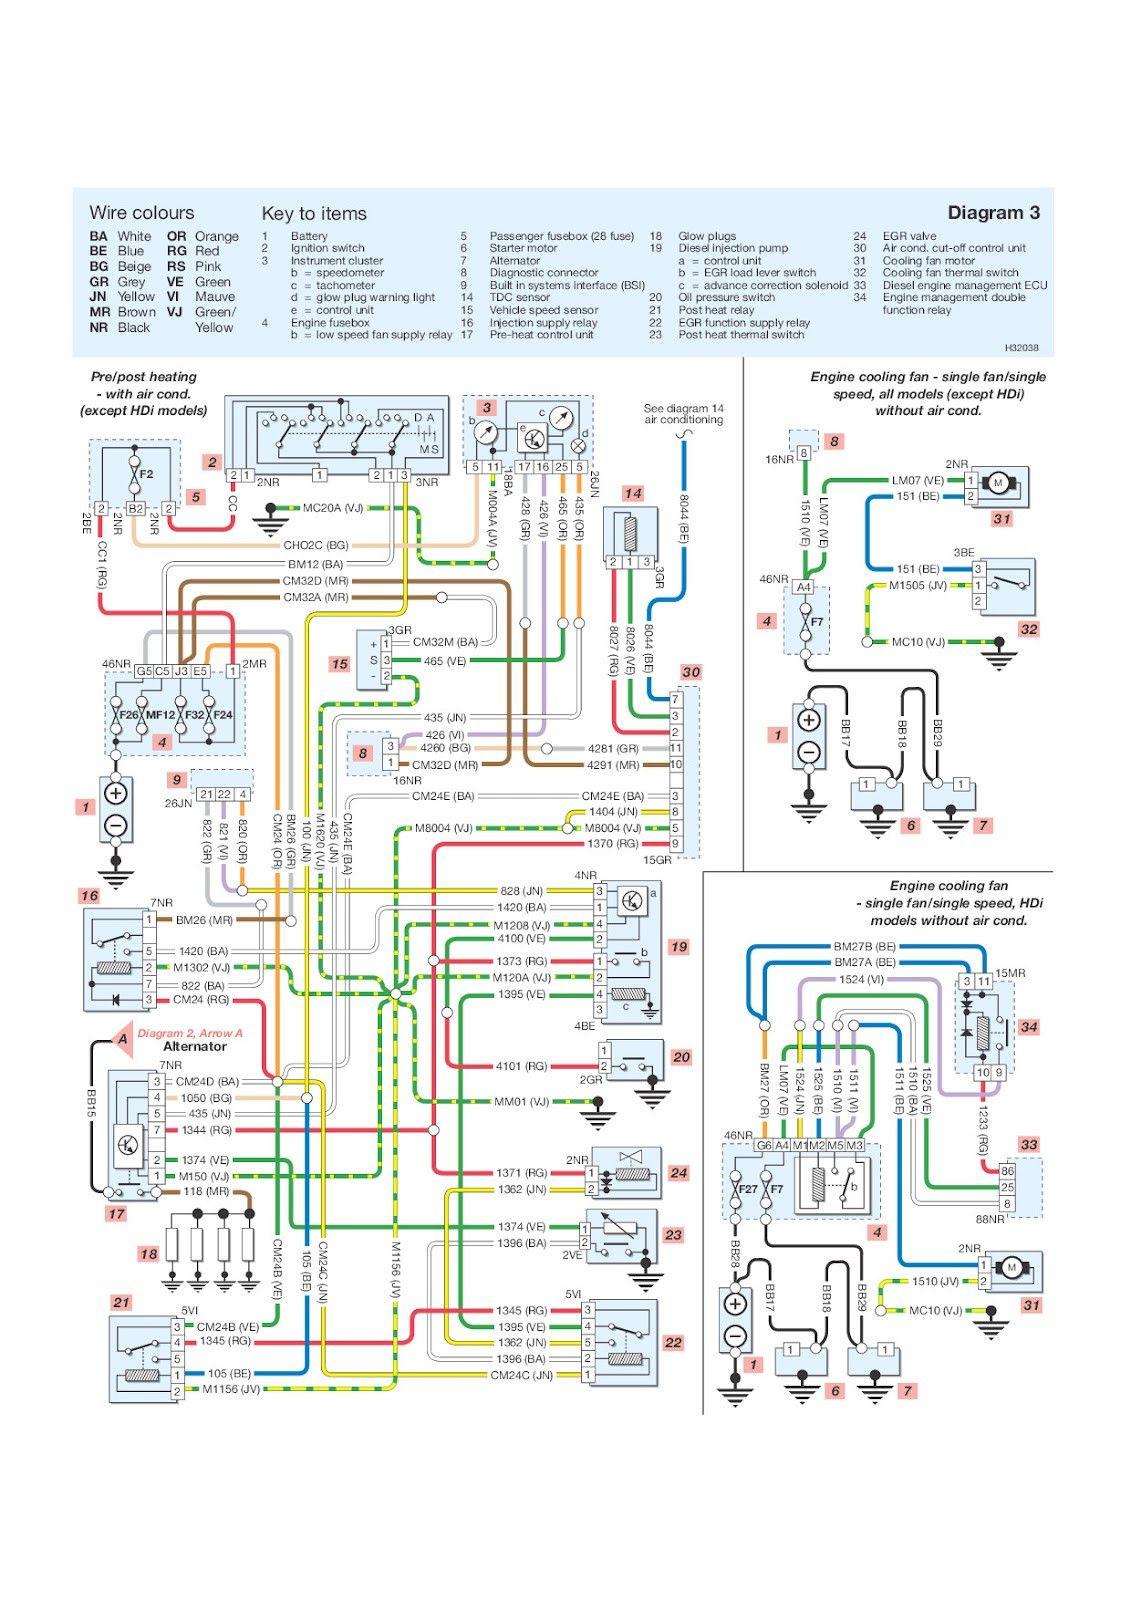 medium resolution of peugeot 307 cc wiring diagram wiring diagram hub alarm wiring diagram peugeot 407 towbar wiring diagram